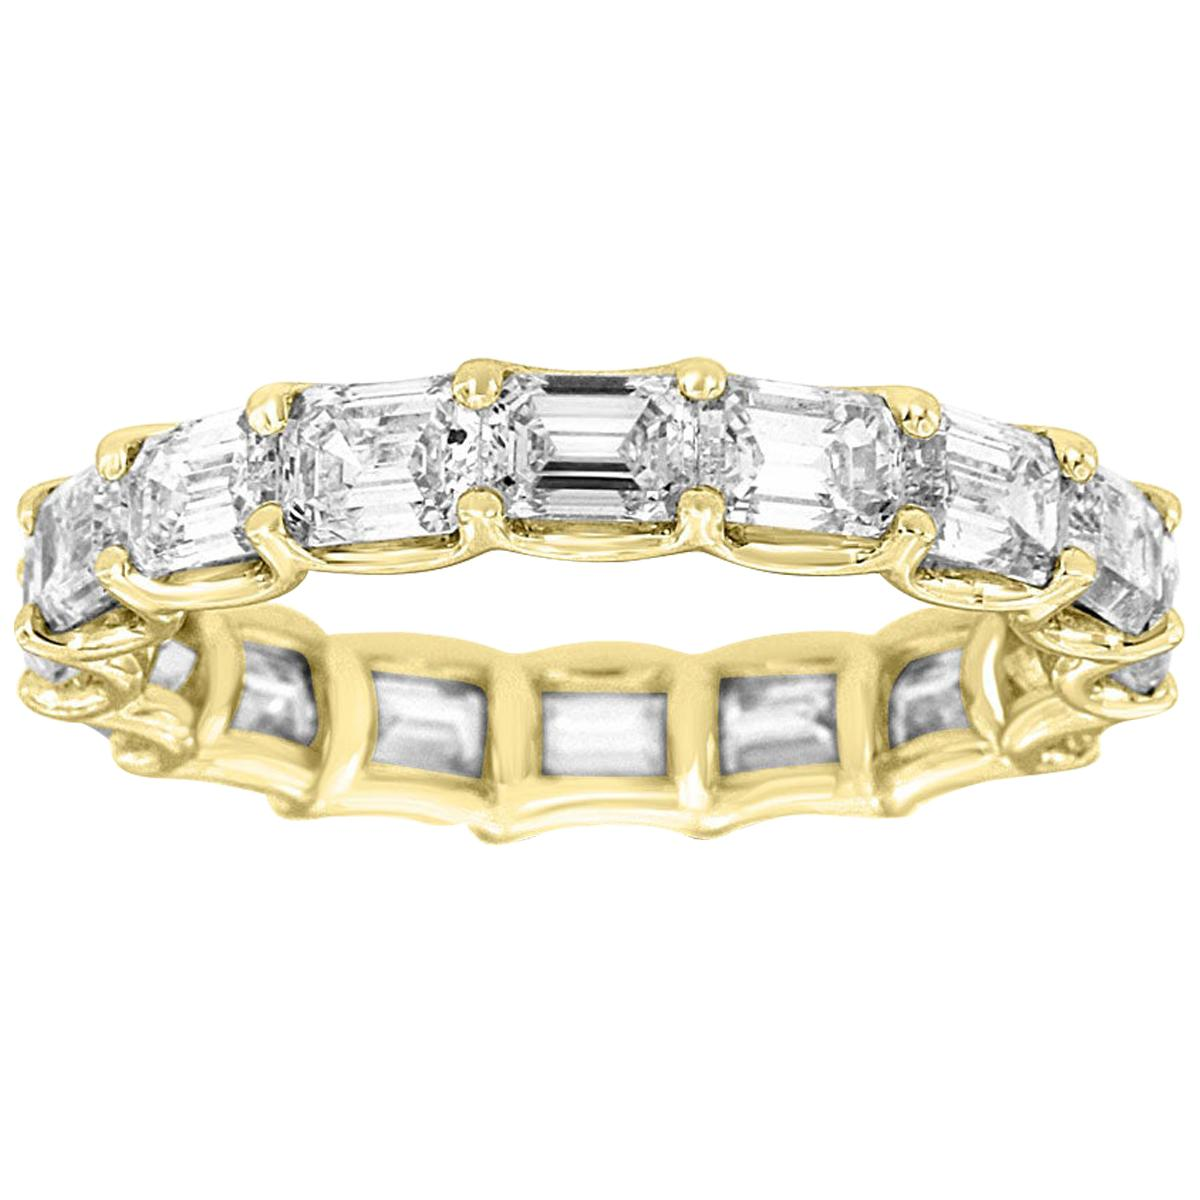 18 Karat Yellow Gold Emerald Eternity Diamond Ring '3 3/4 Carat'